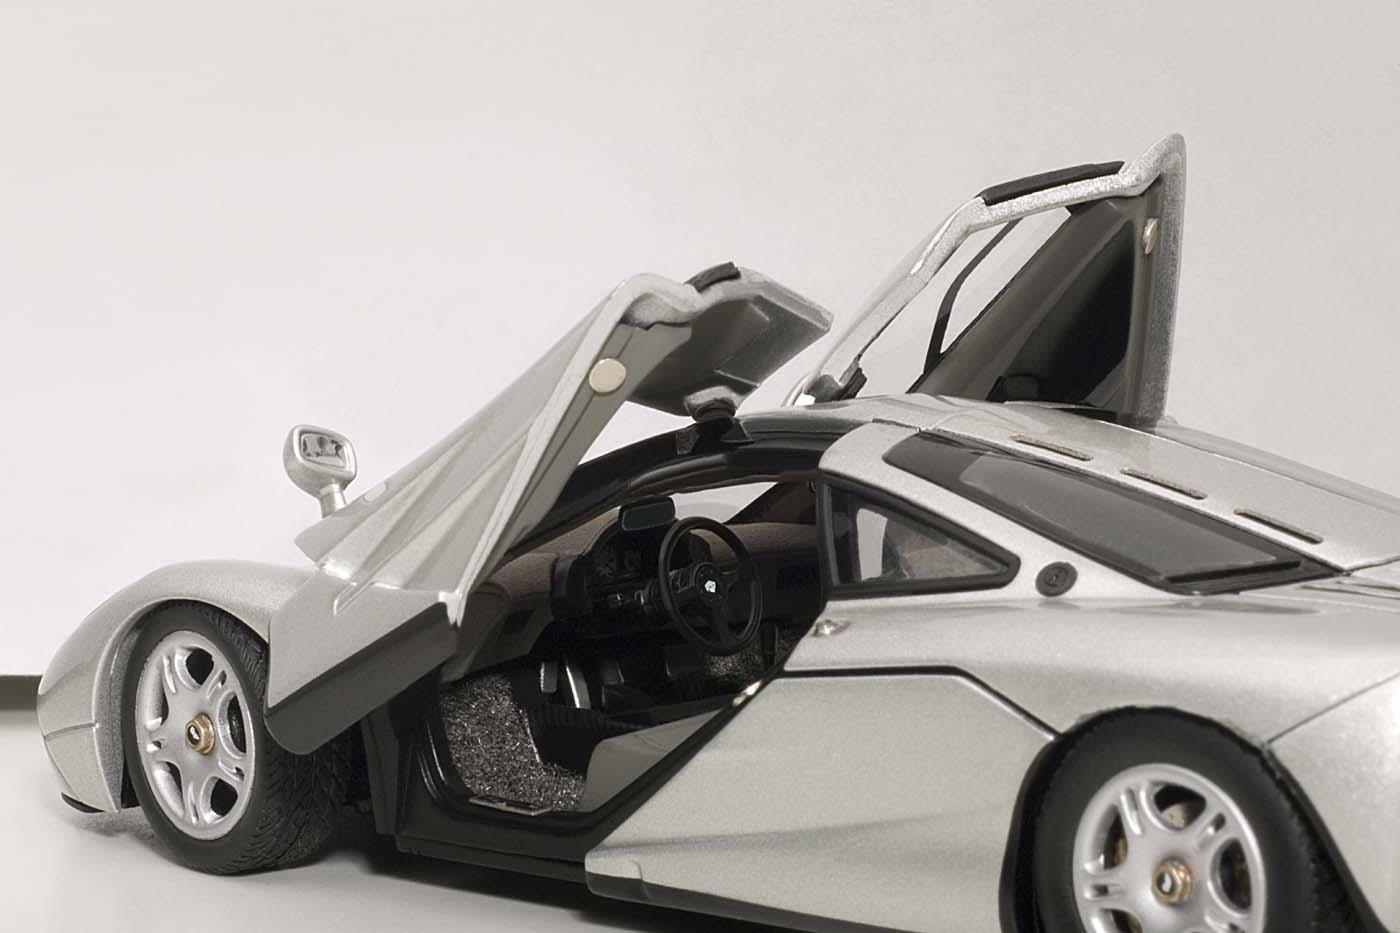 autoart 1:43 scale mclaren f1 eztoys - diecast models and collectibles